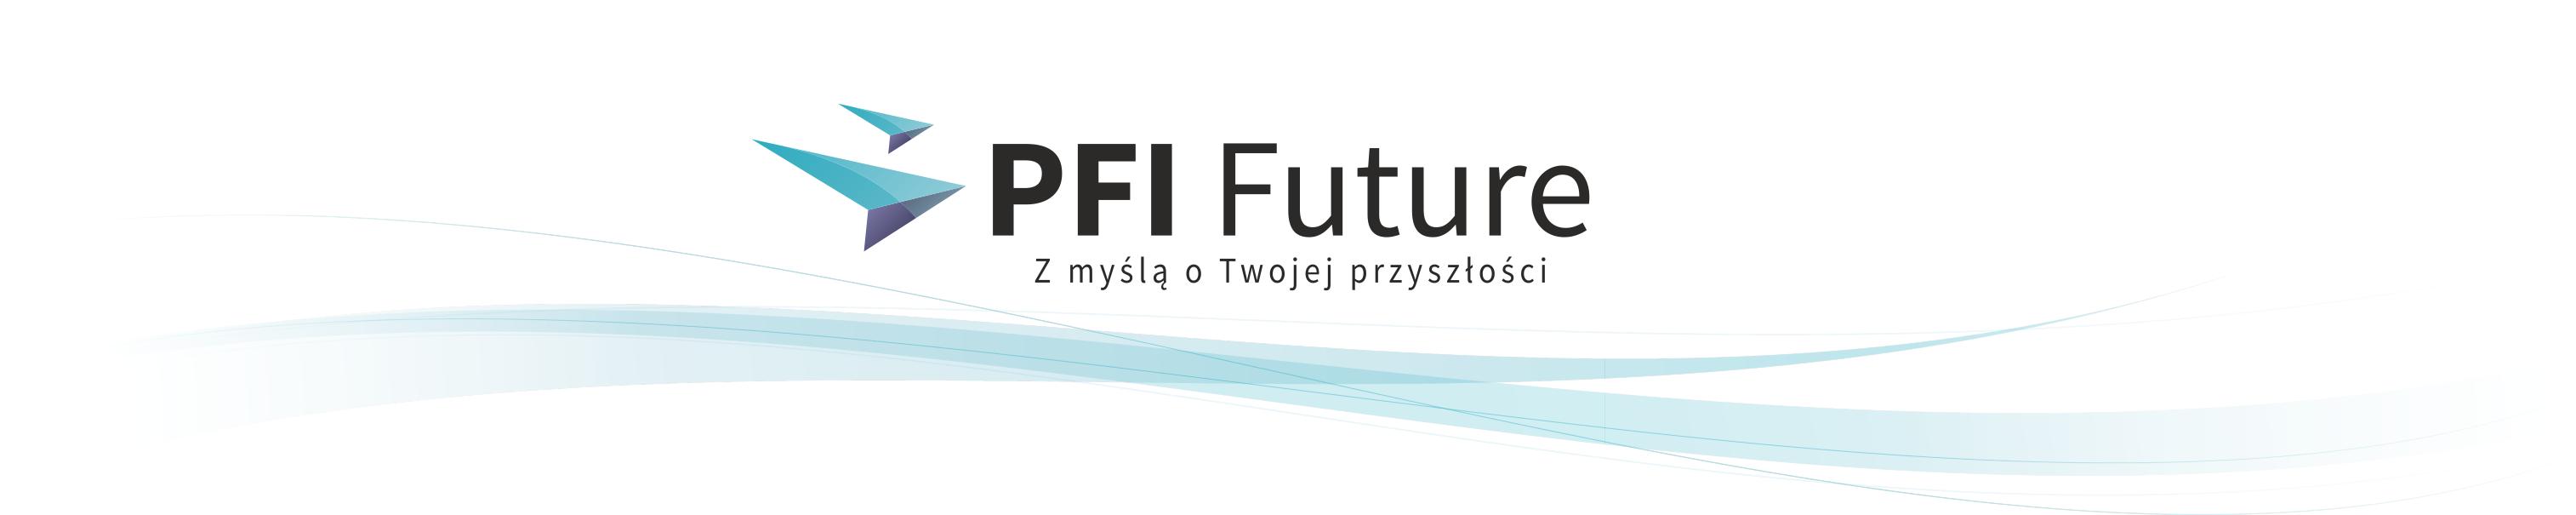 PFI Future SA